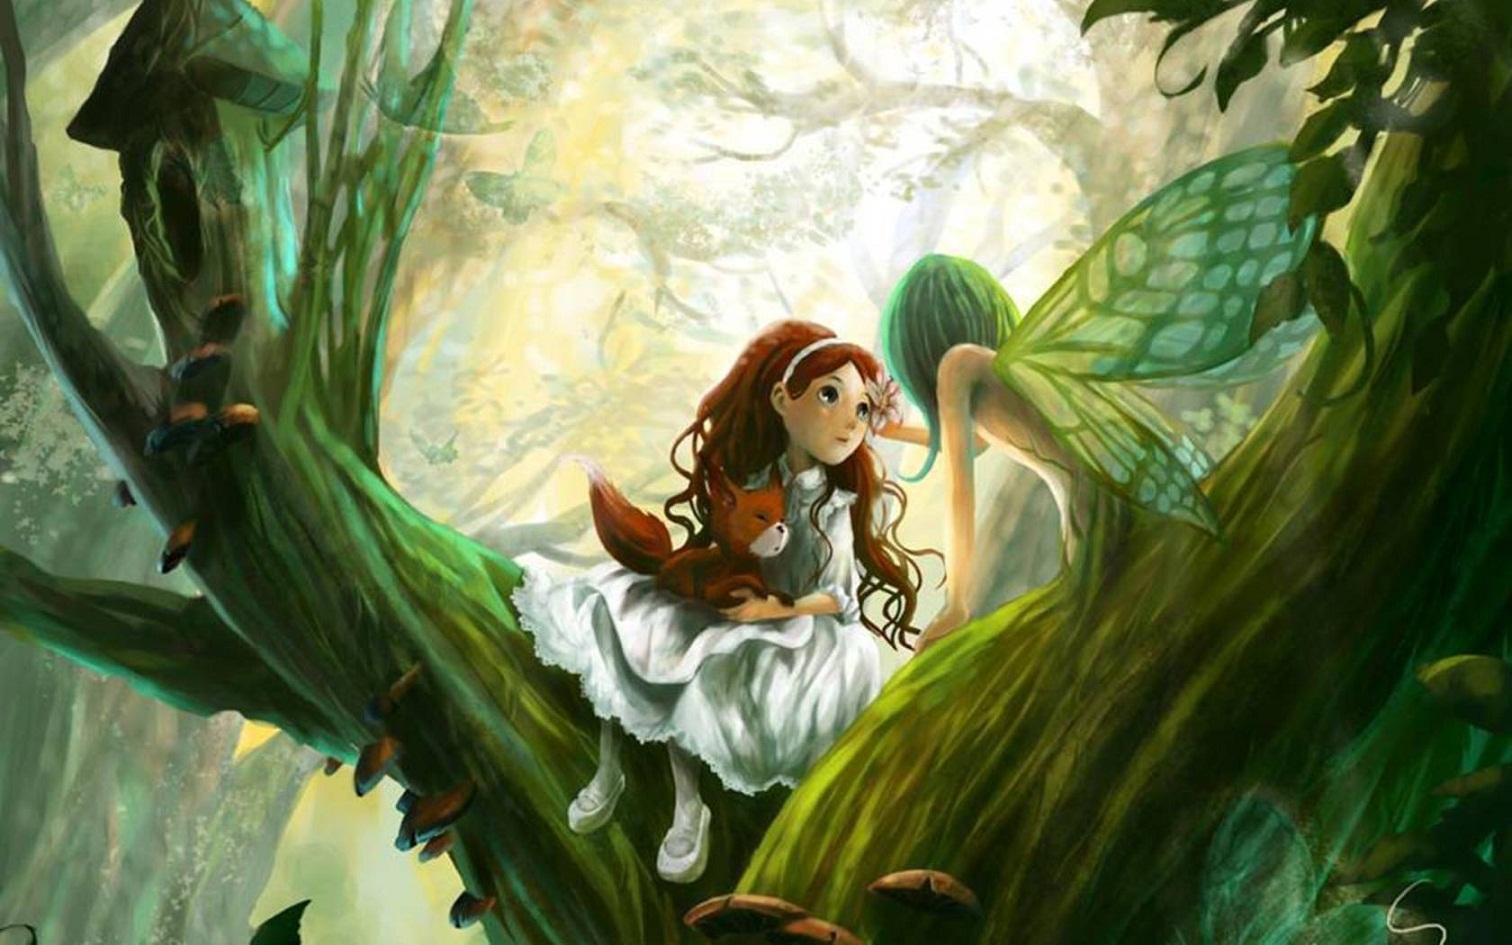 fees et elfes vi - Page 10